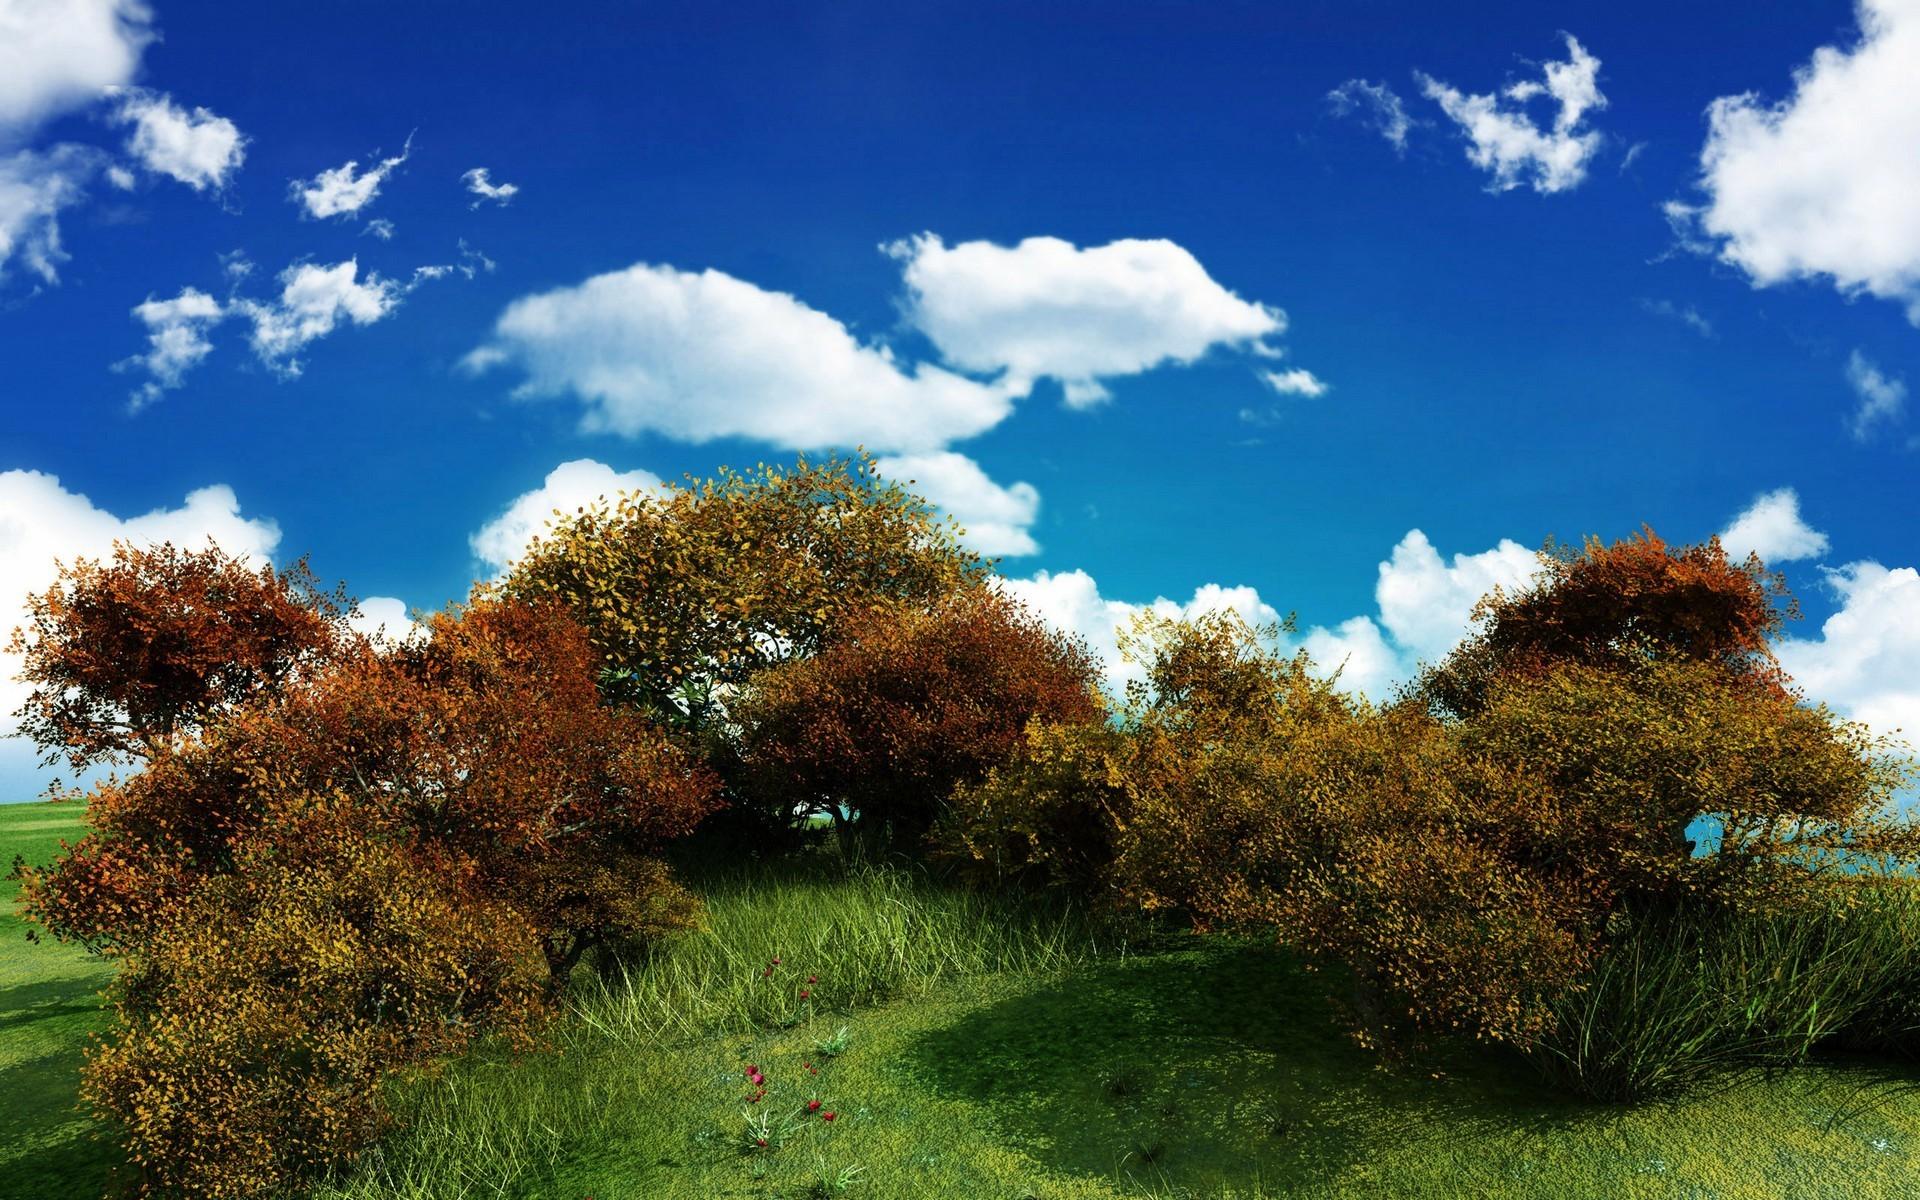 Sfondi bellissimi hd 87 immagini for Sfondi hd natura